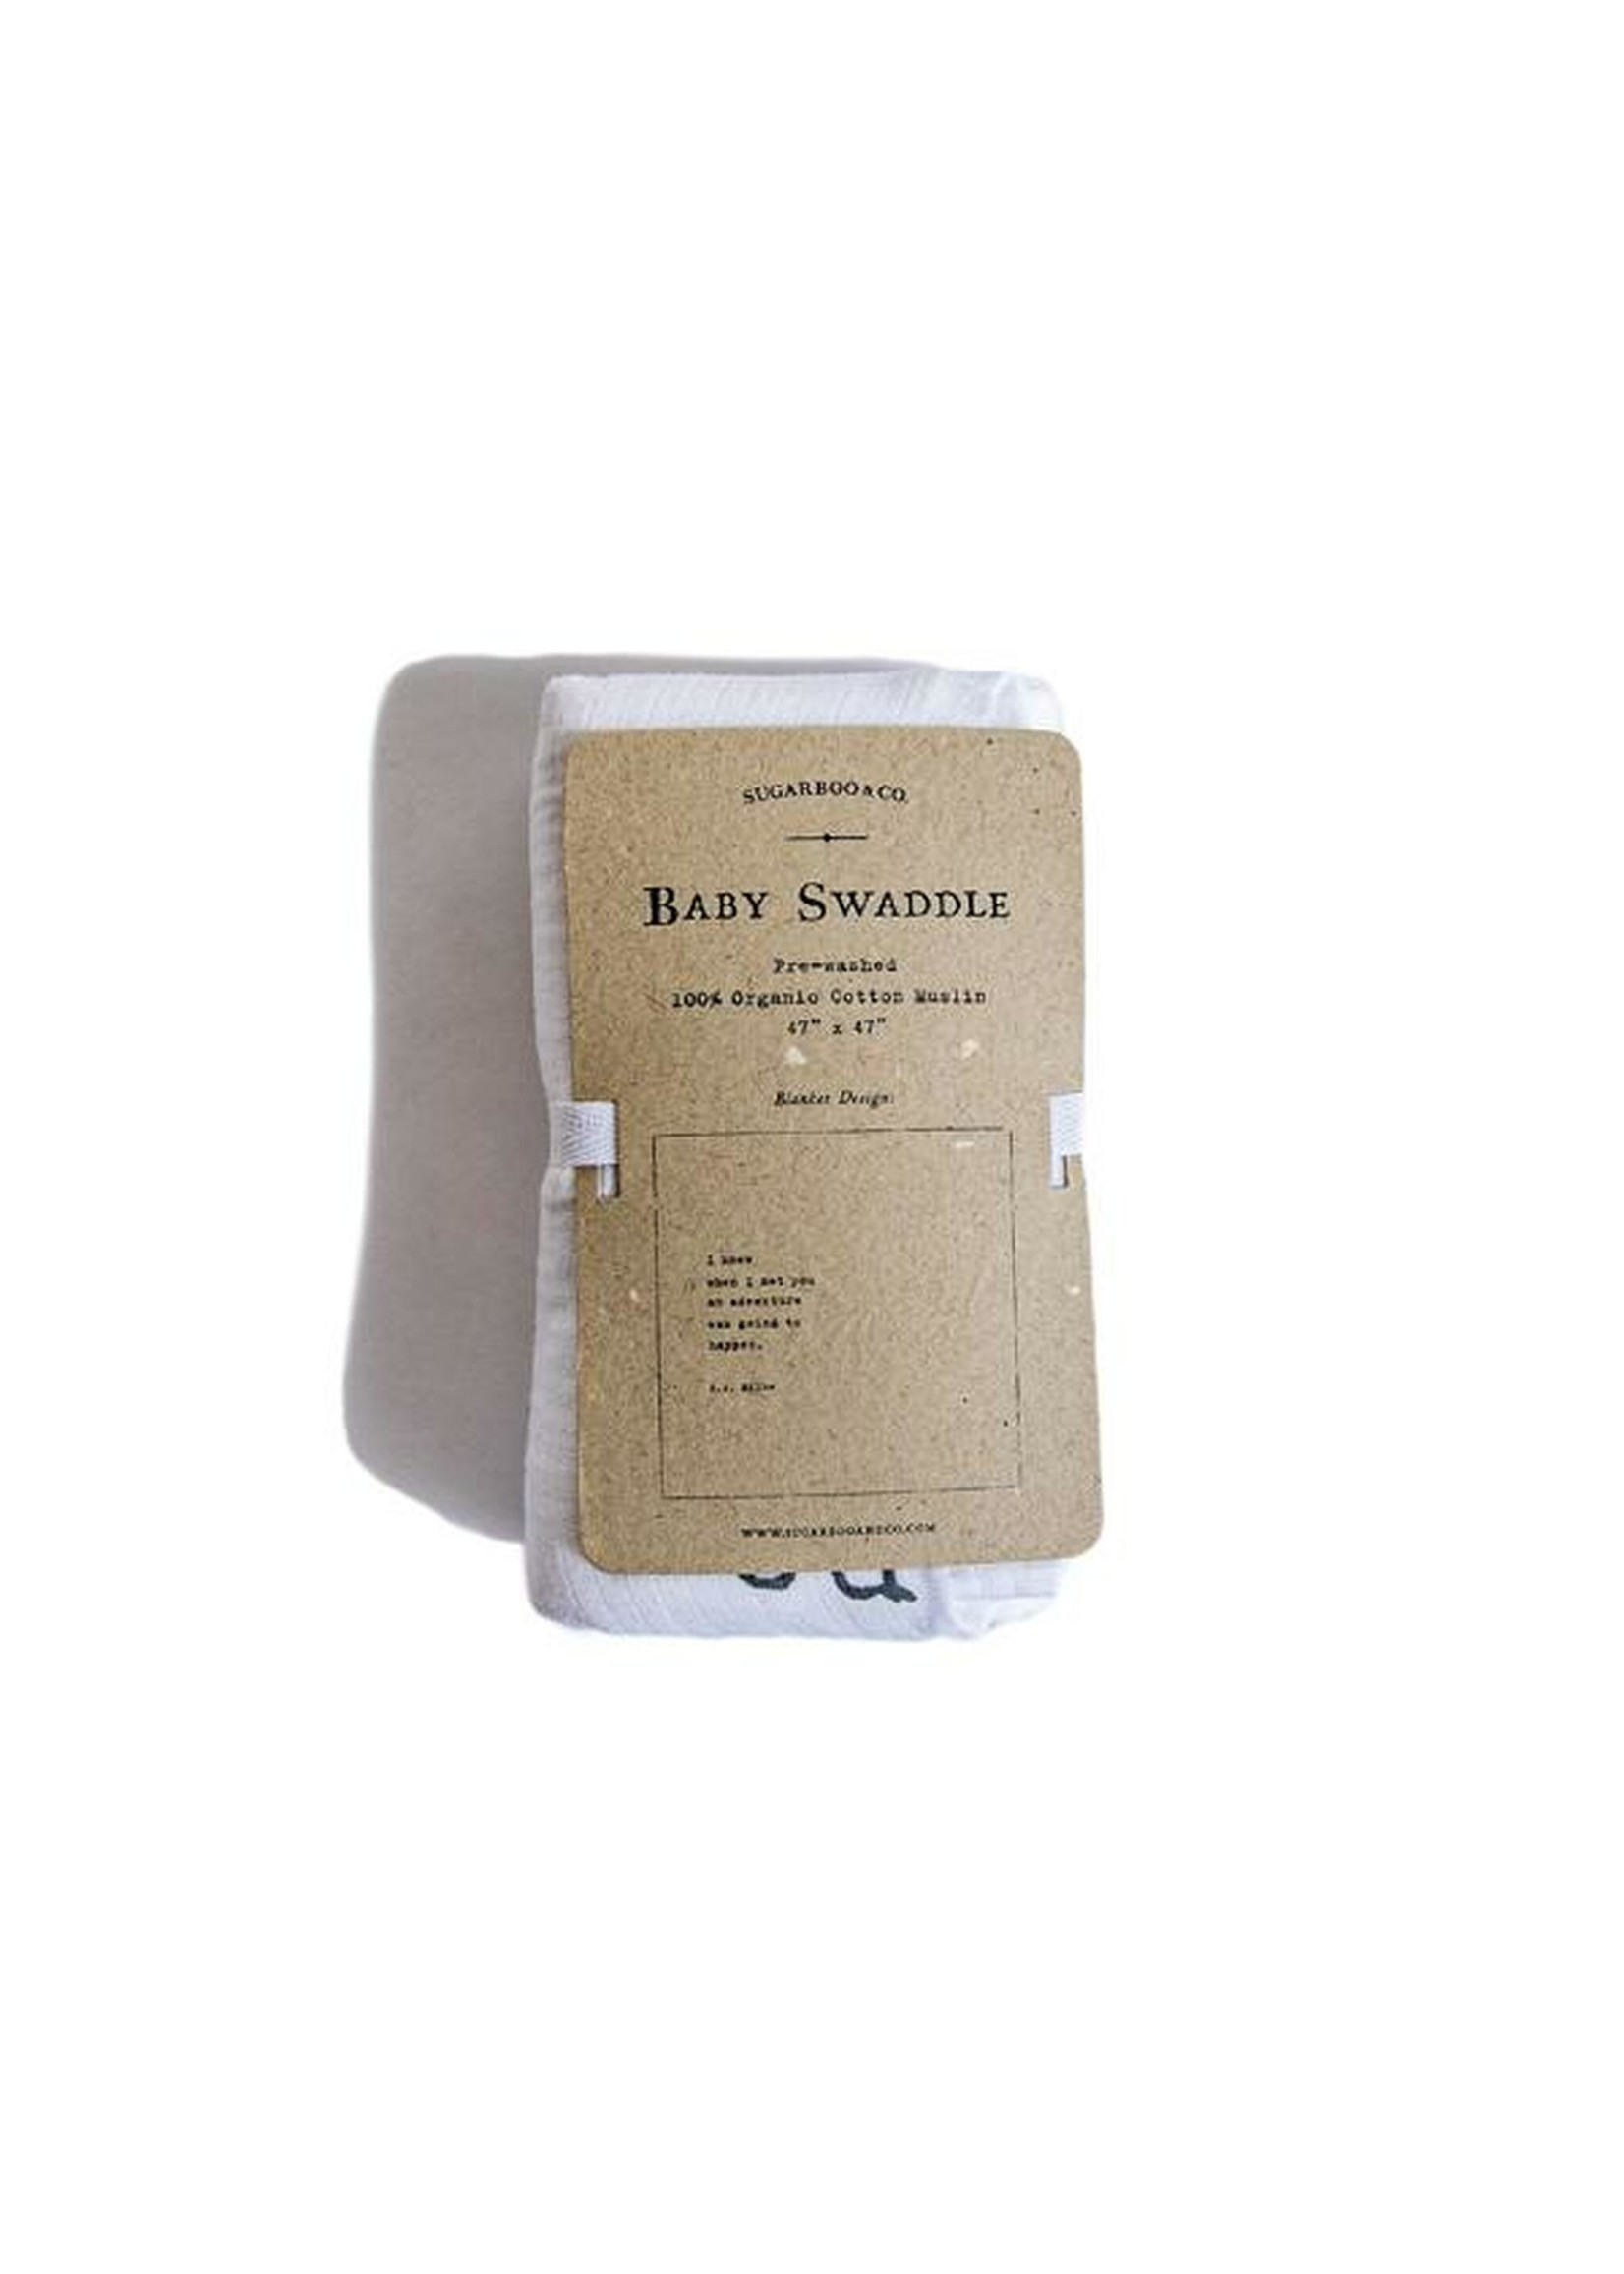 Sugarboo Sugarboo & Co. Organic Swaddle - A.A. Milne